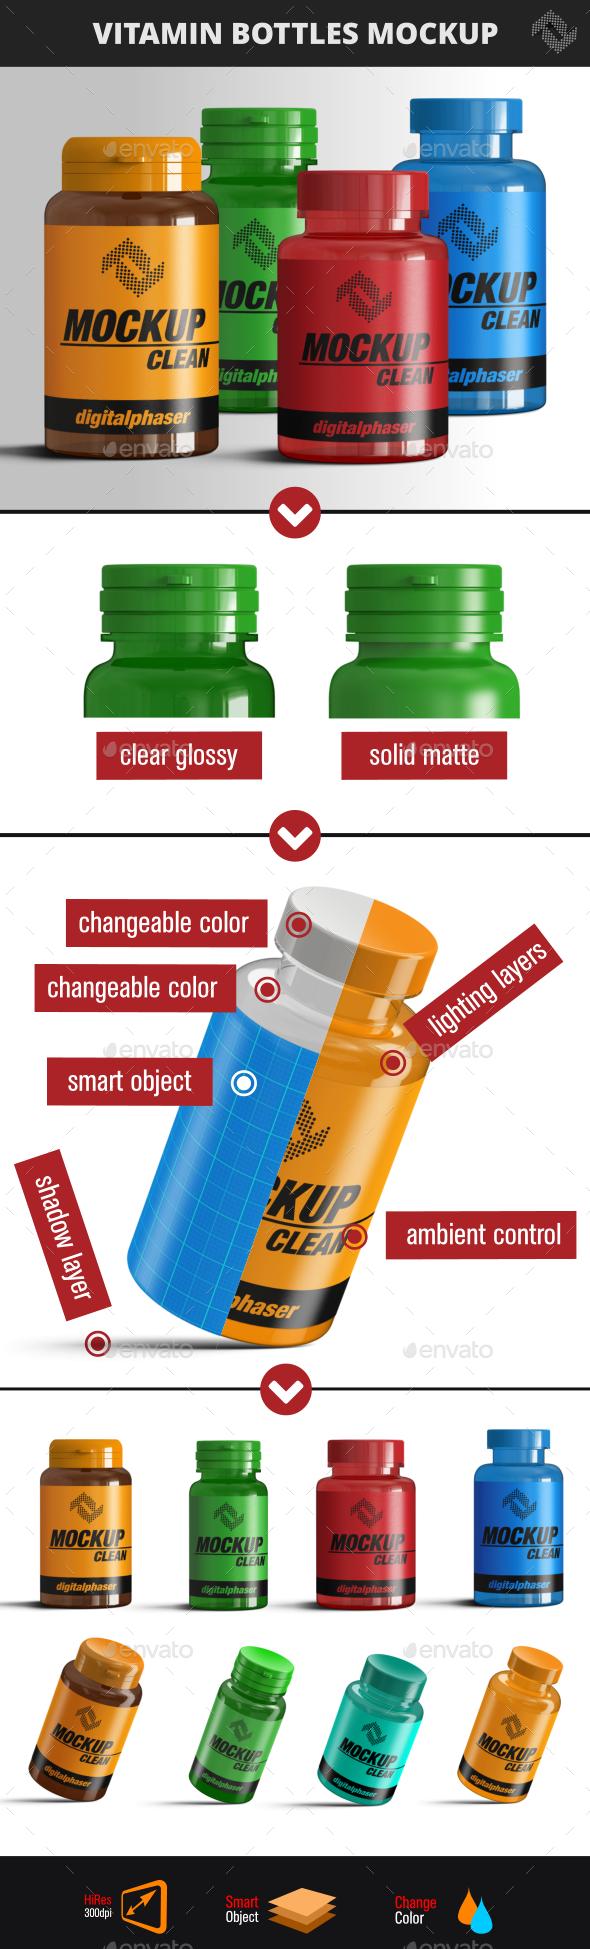 Vitamin and  Pill Bottles Mockup - Packaging Product Mock-Ups